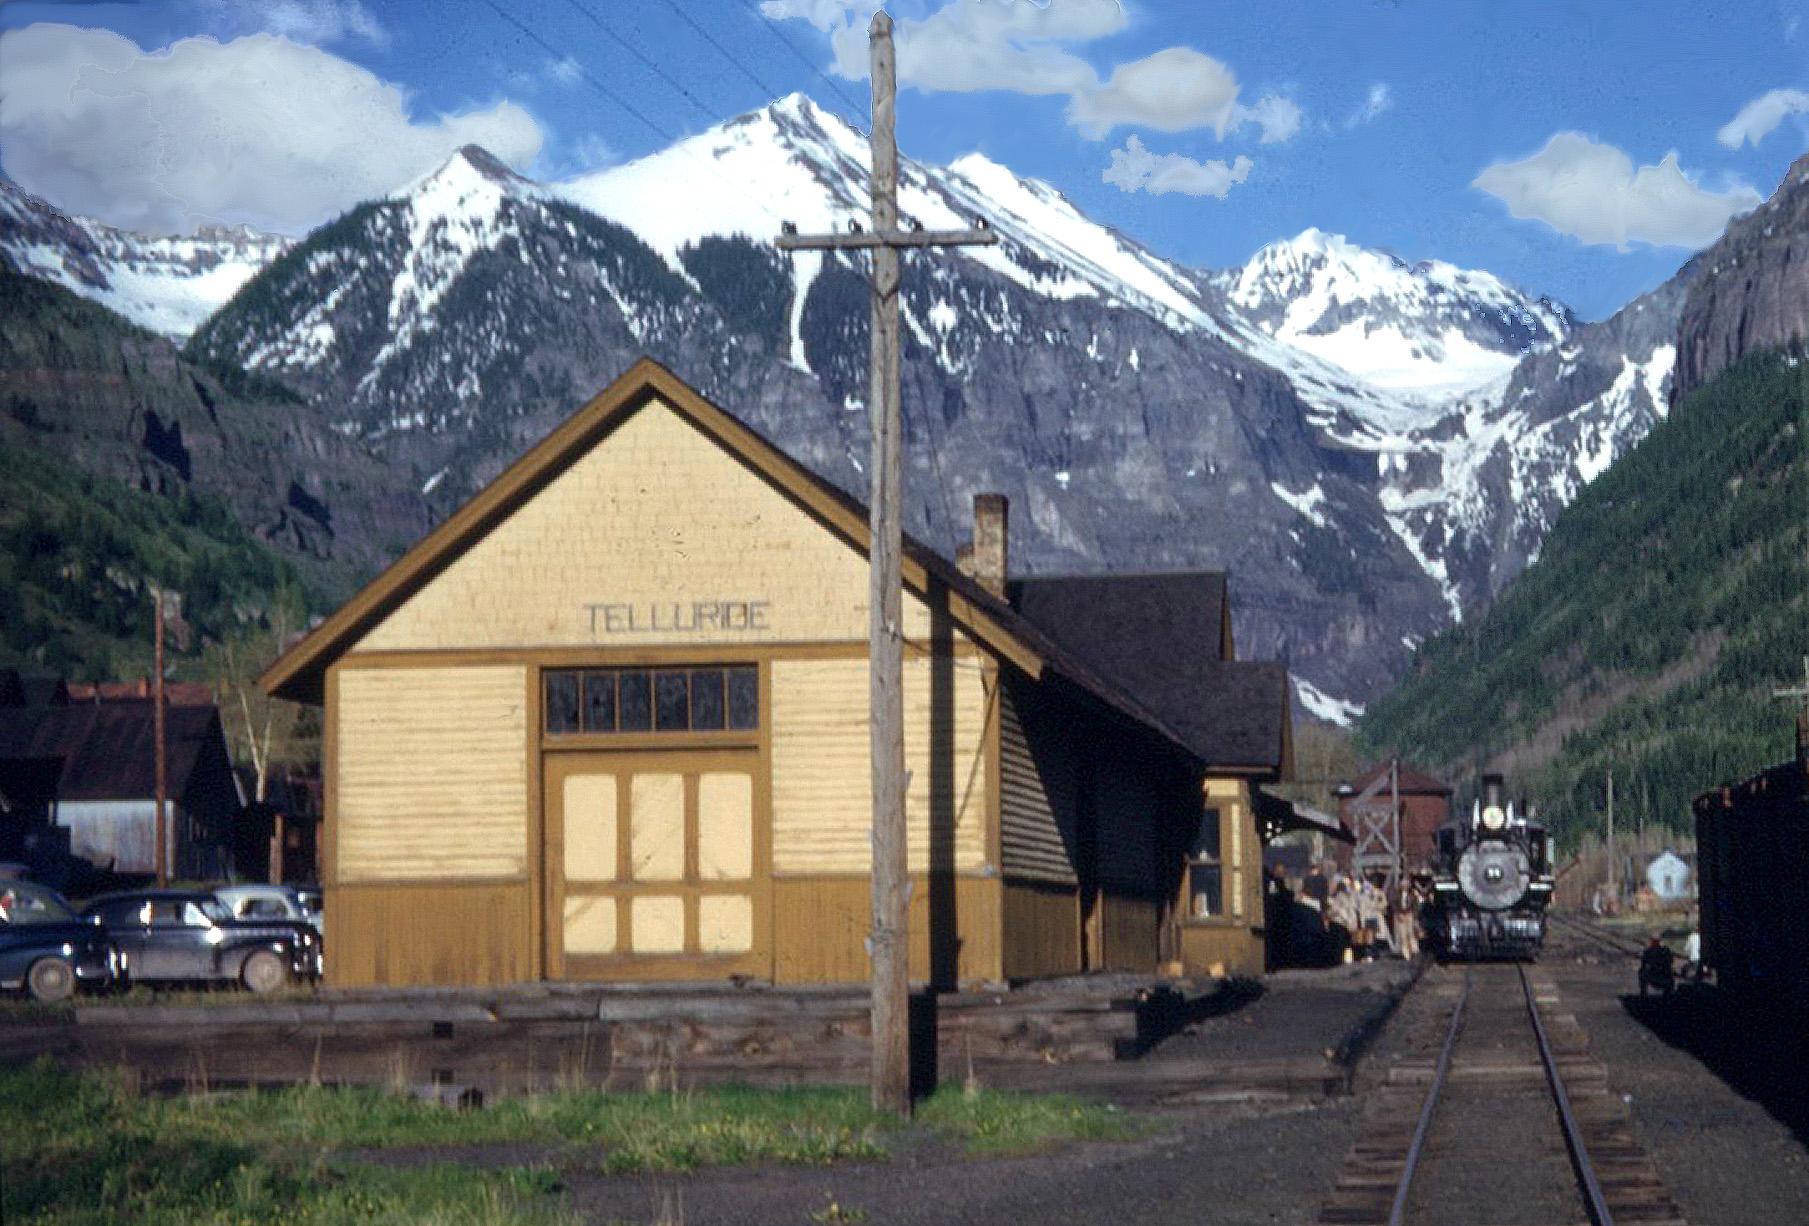 RGS 74 at Telluride station mountain scene.jpg